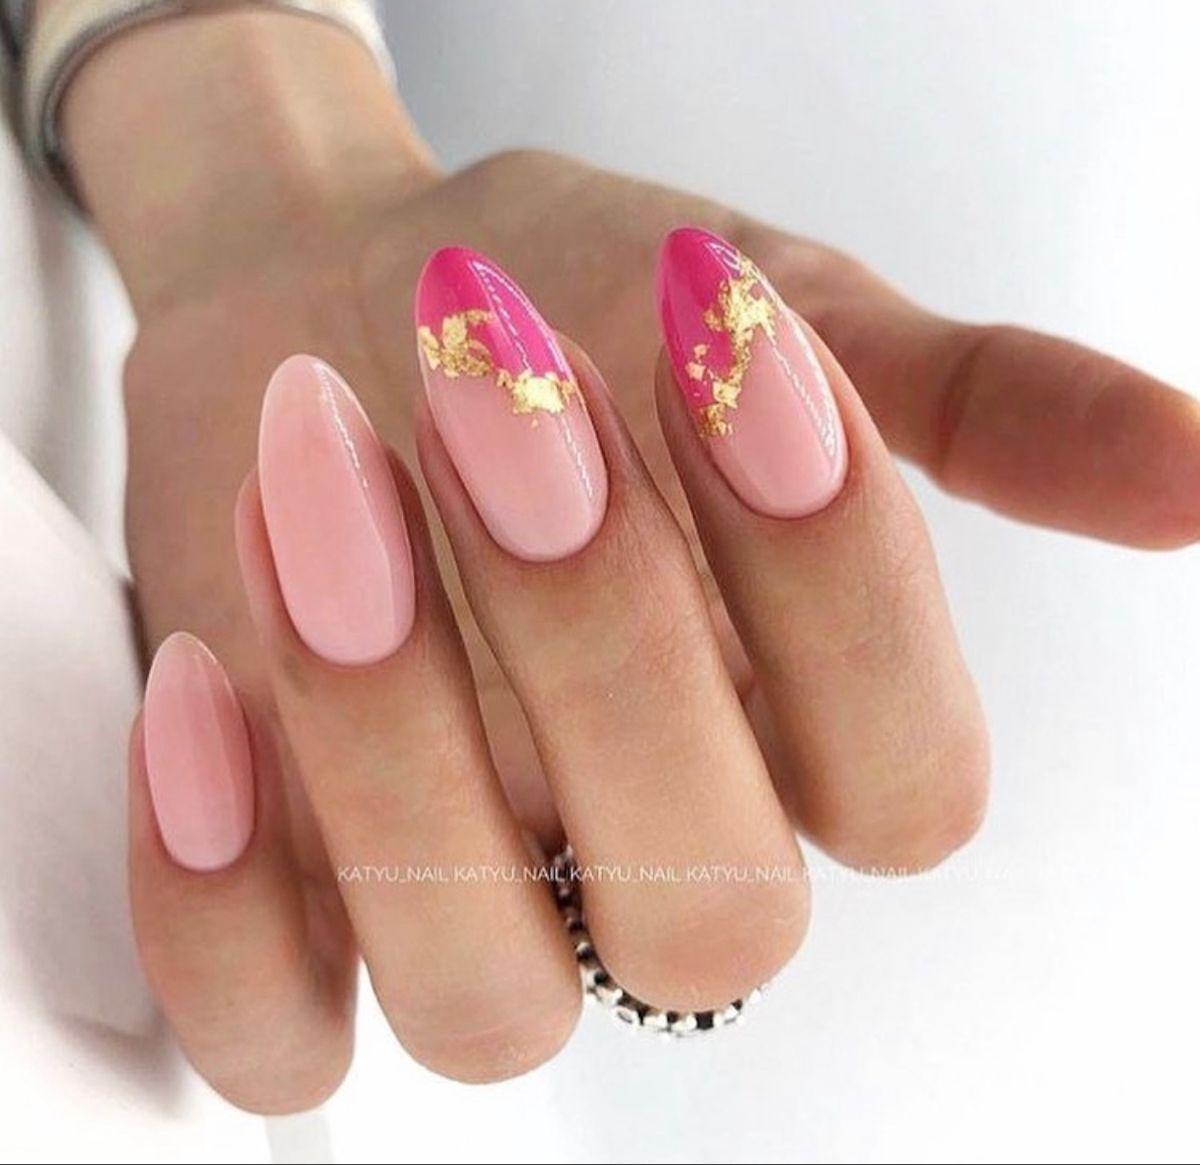 Pin By Ajuse Zizkova On Unitas In 2020 Short Acrylic Nails Stylish Nails Pink Nails